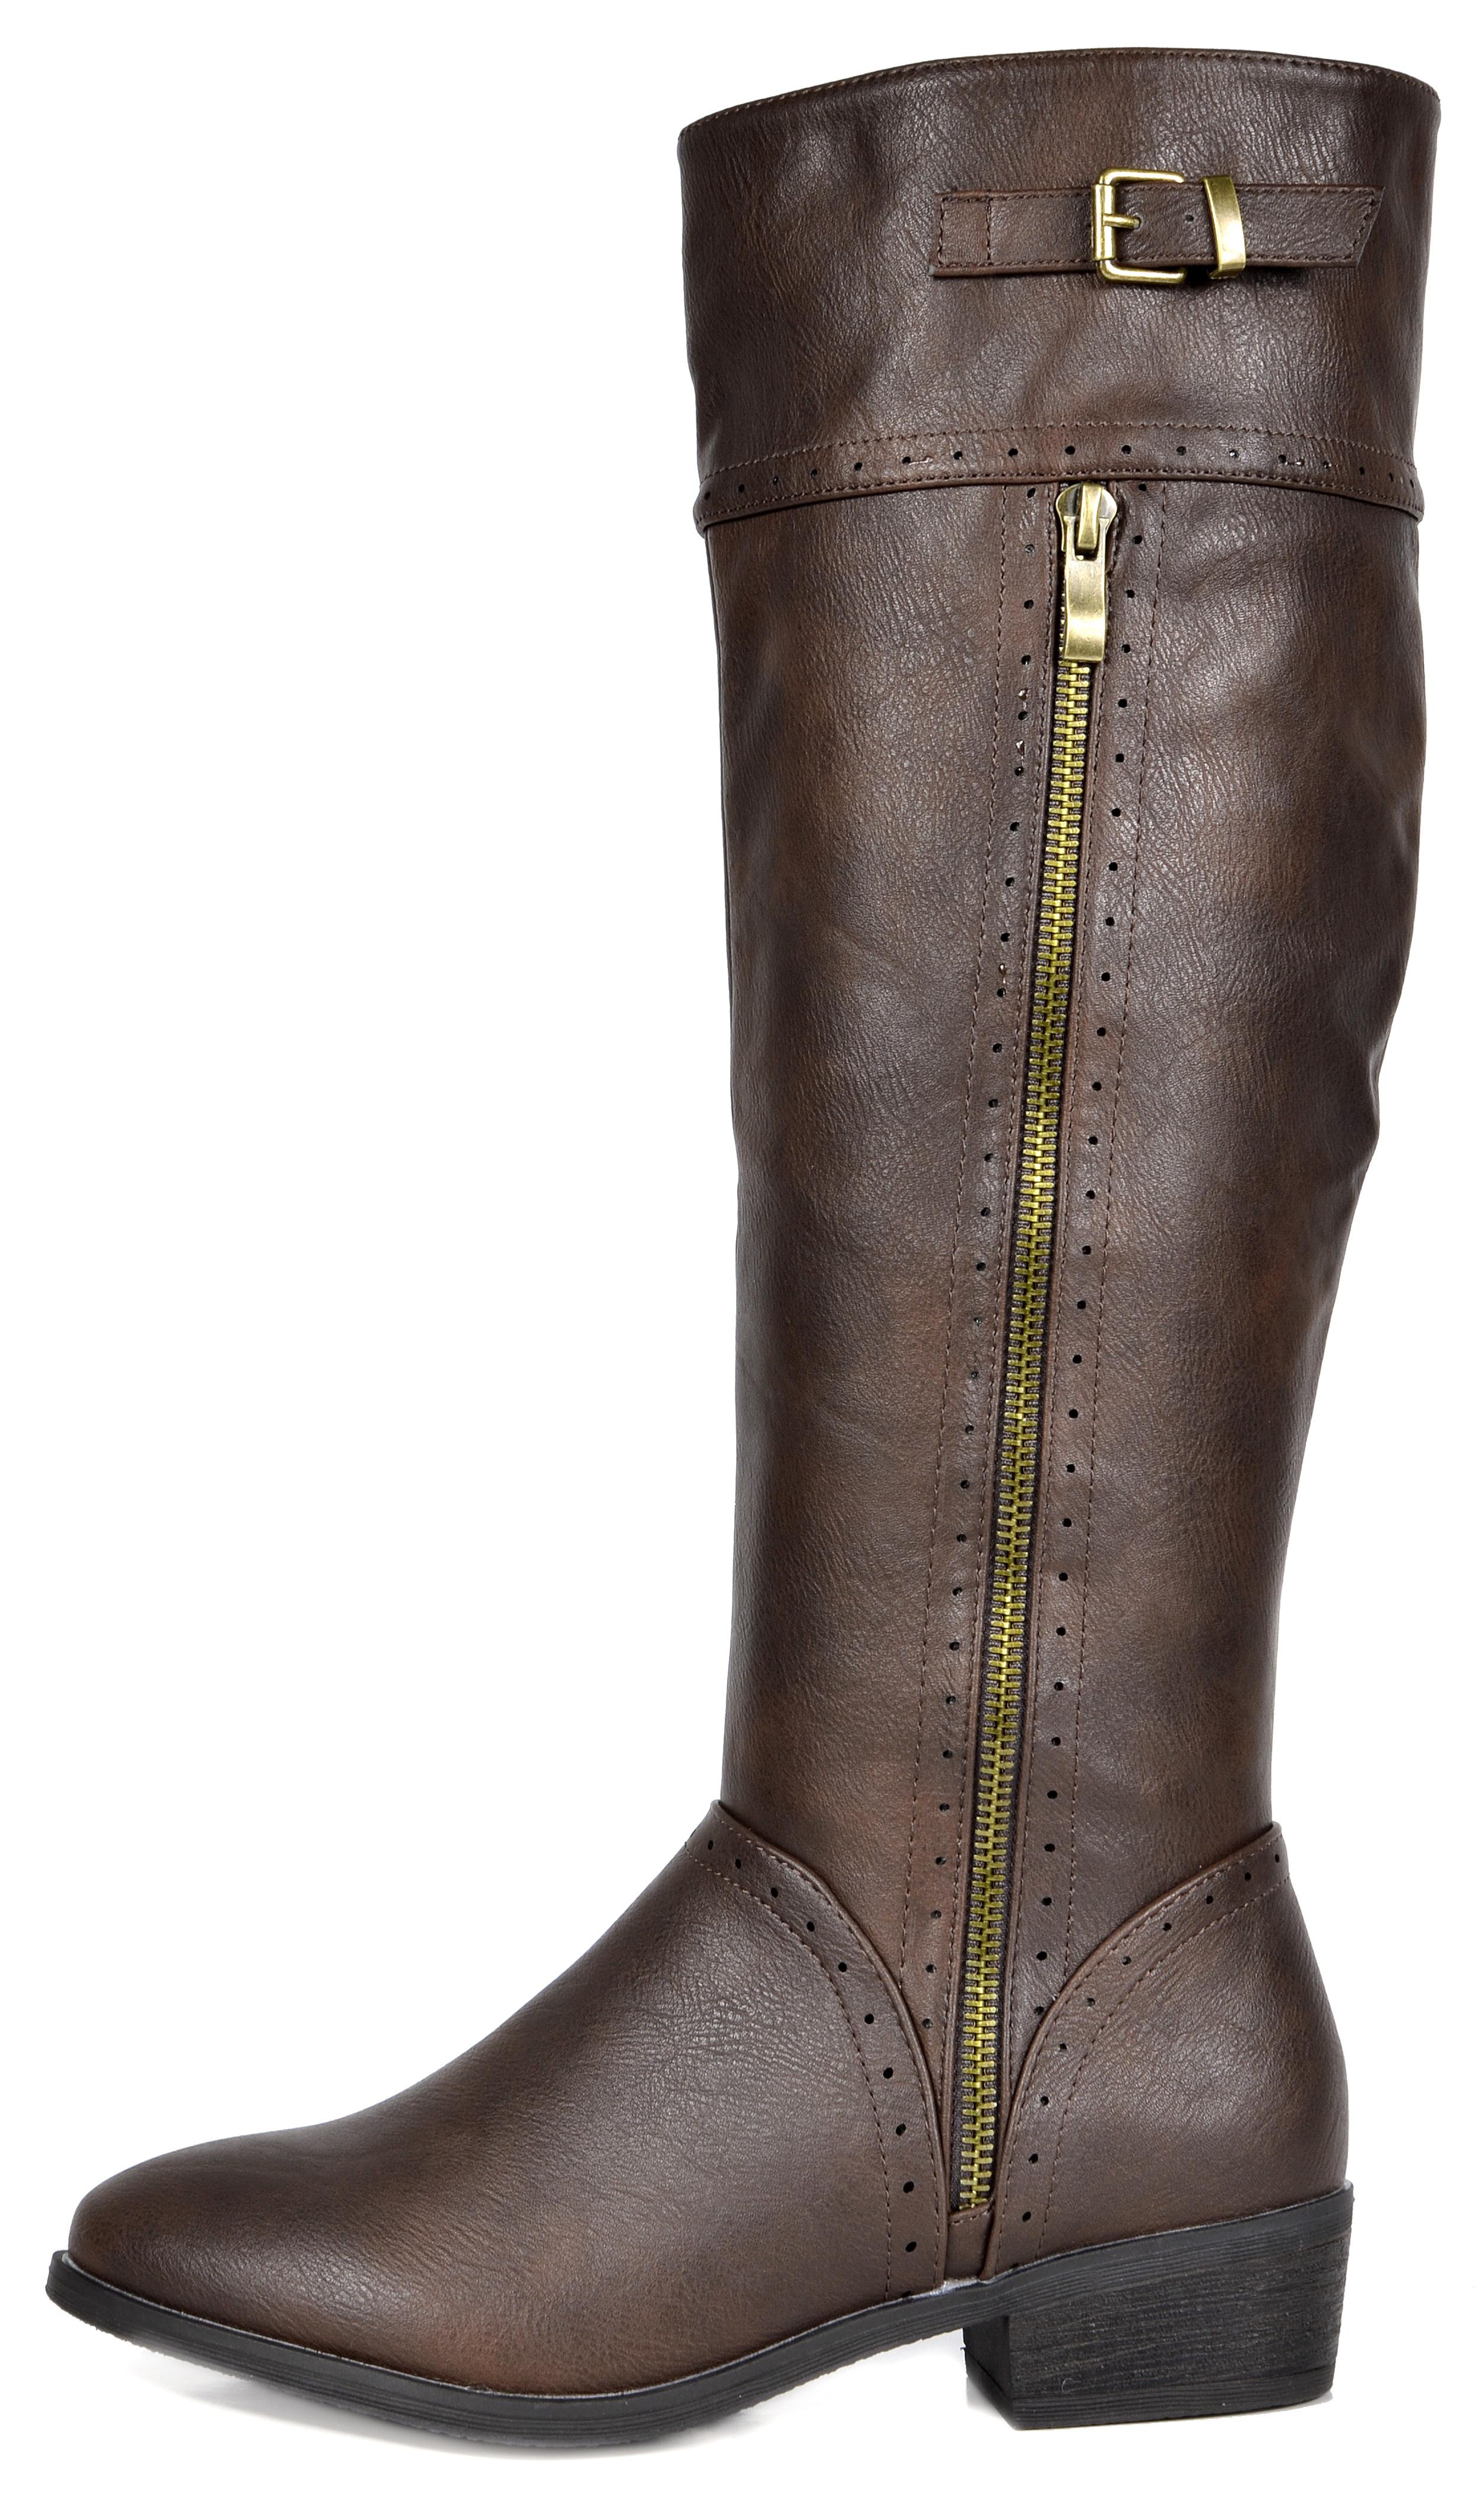 83cda459e0e DREAM PAIRS Women s Koson Knee High Winter Riding Boots (Wide Calf ...